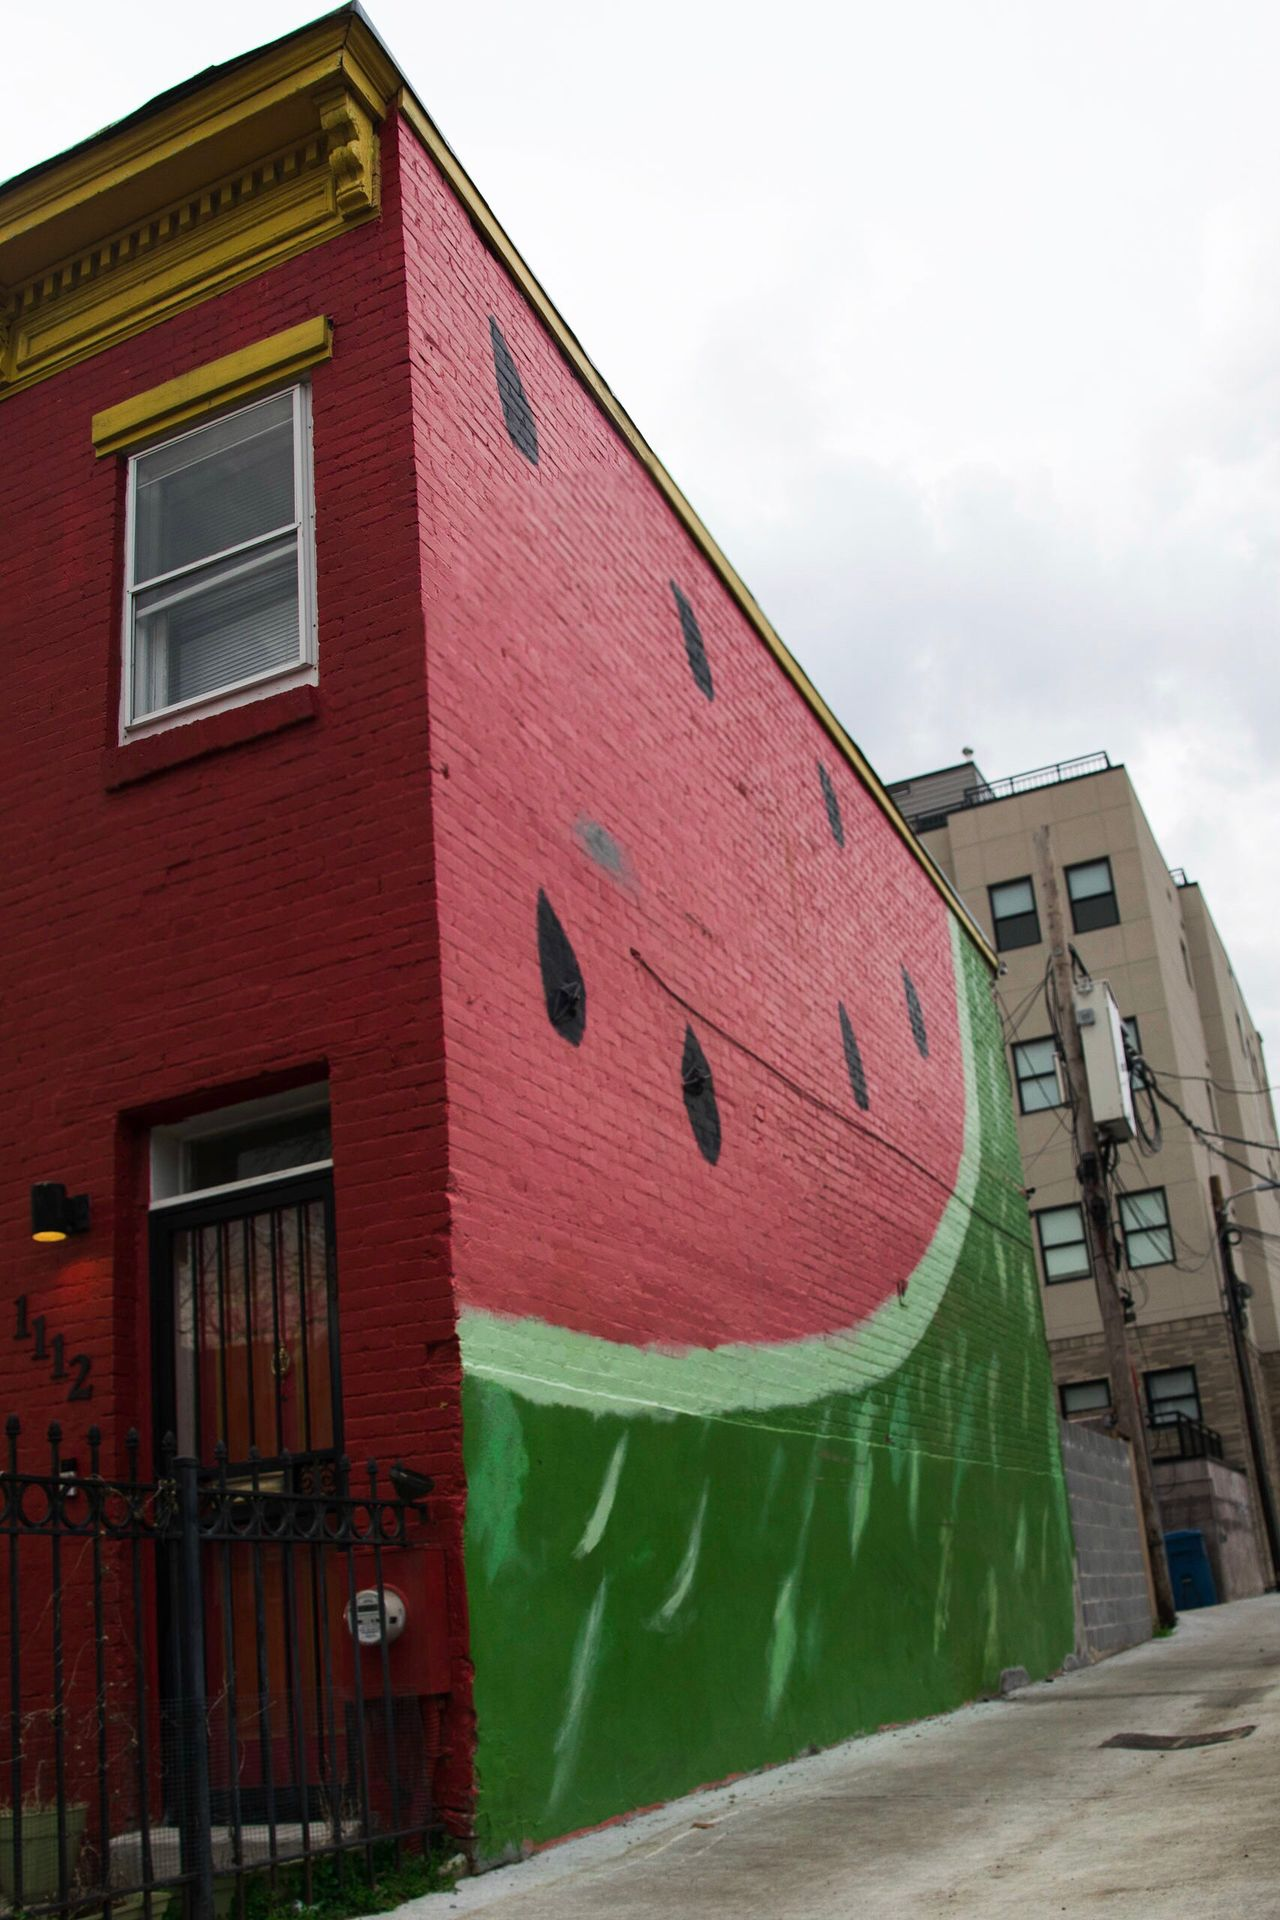 Millennial Pink Architecture Built Structure Outdoors Watermelon Fruit Colorful